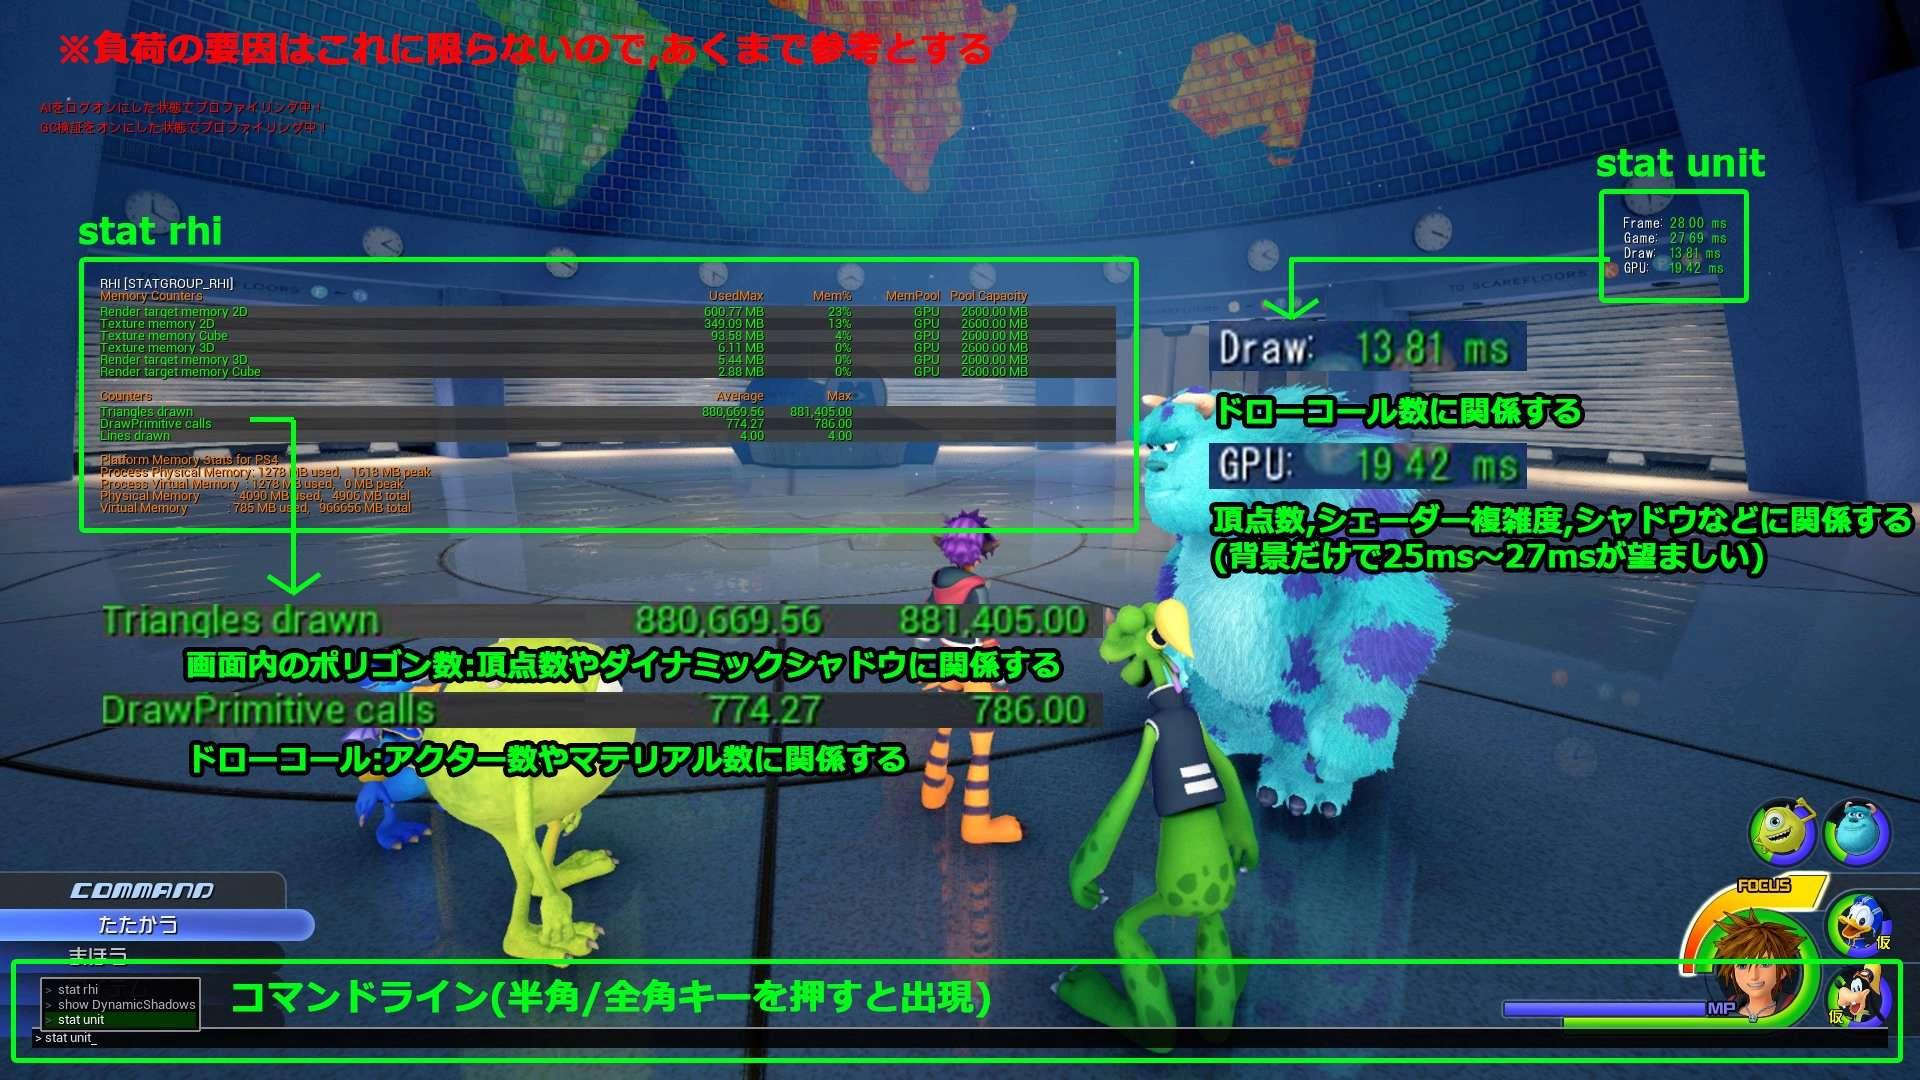 Kingdom Hearts 3 Monster Inc Leak 2